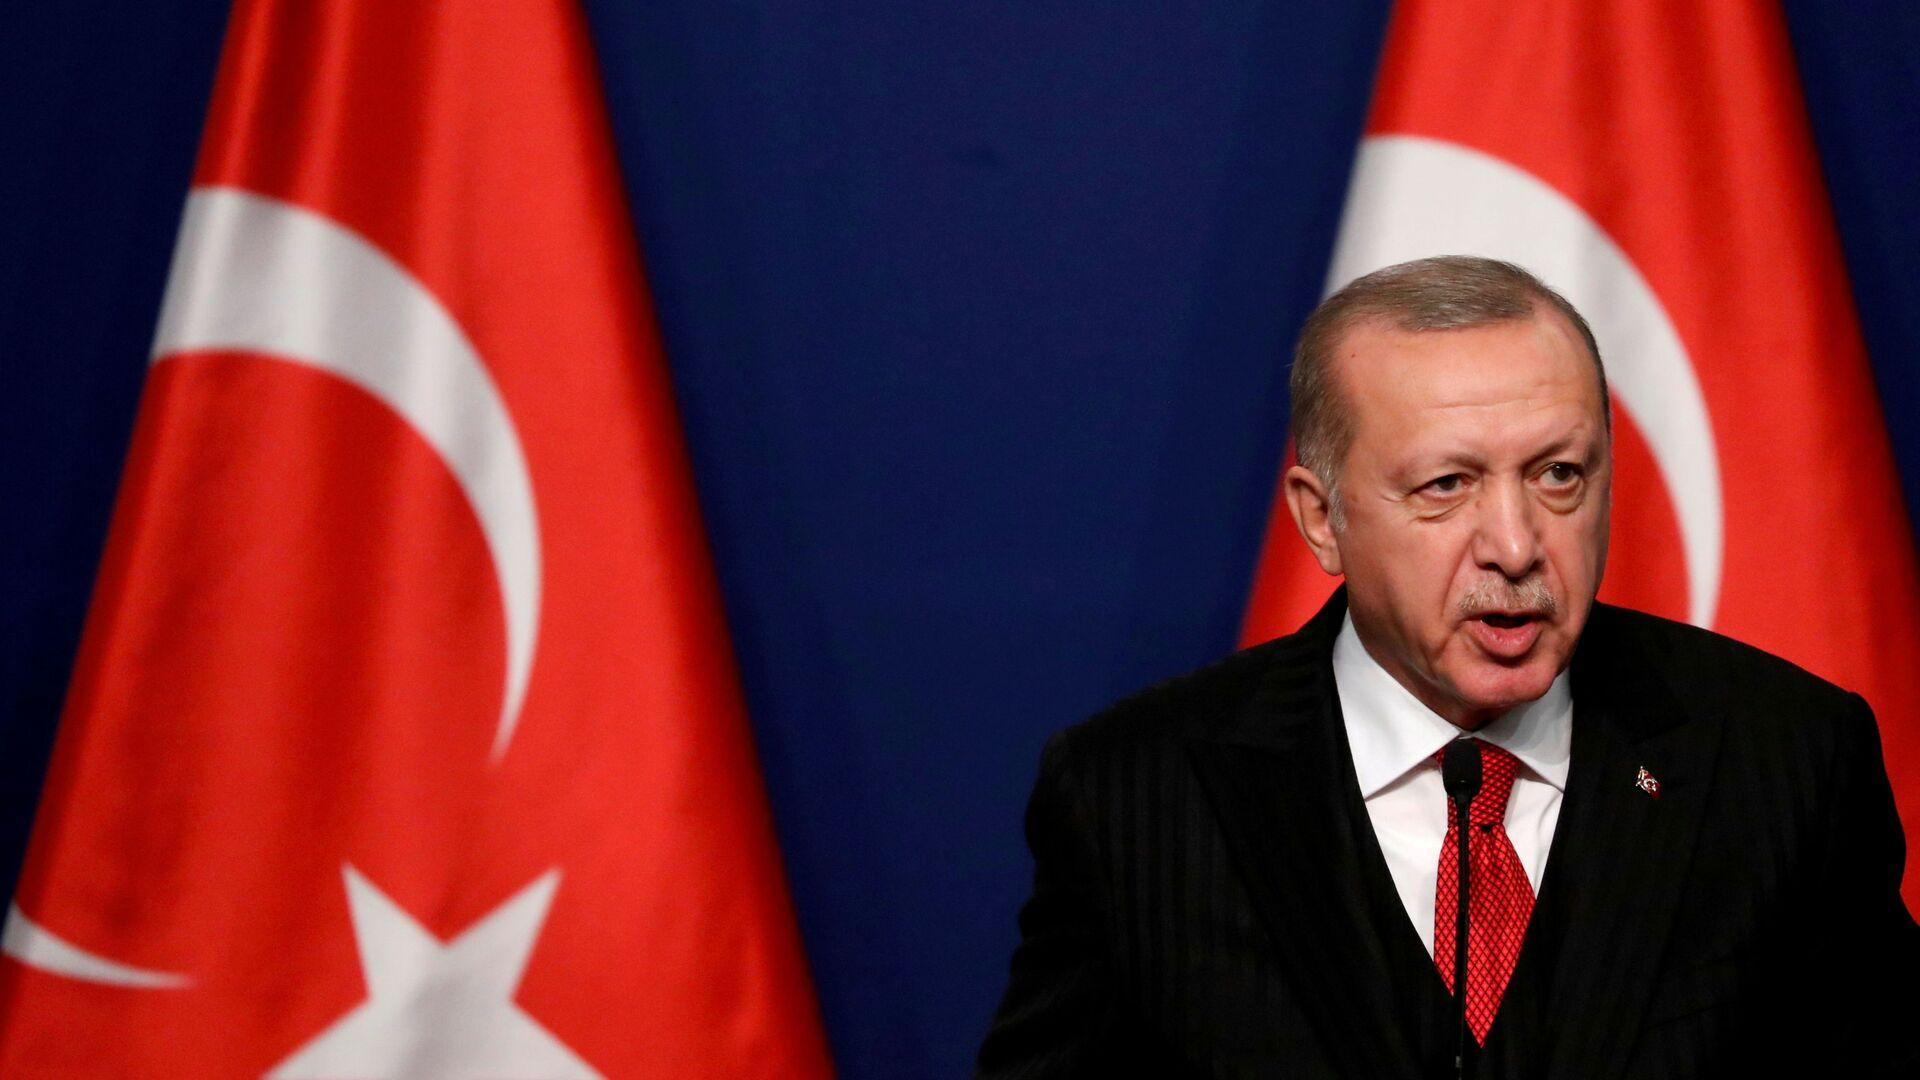 Prezydent Turcji Recep Tayyip Erdogan. - Sputnik Polska, 1920, 29.08.2021